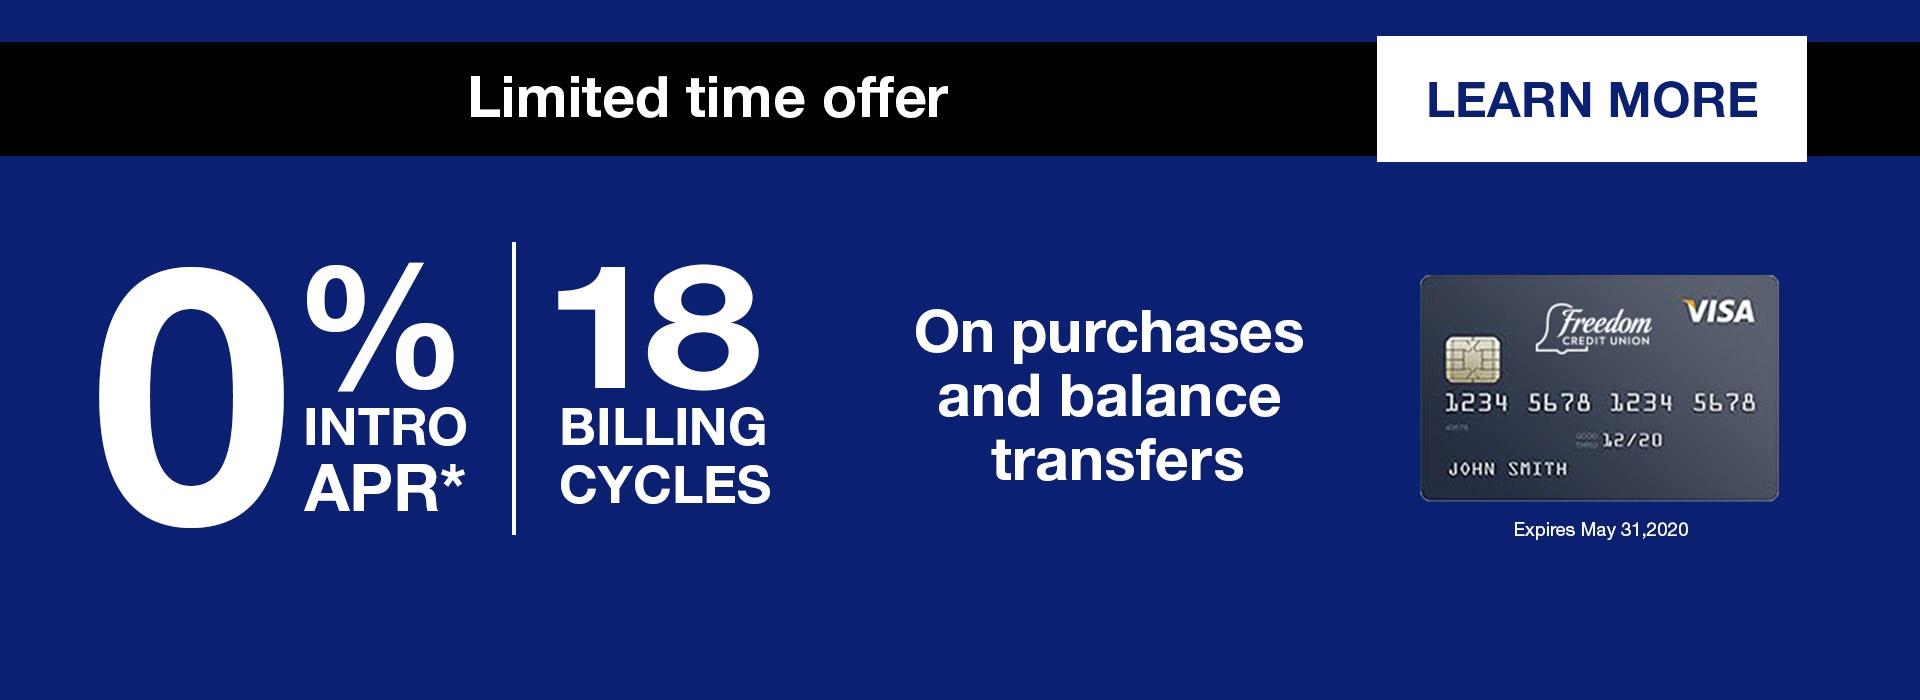 Credit Card Offer - 18%